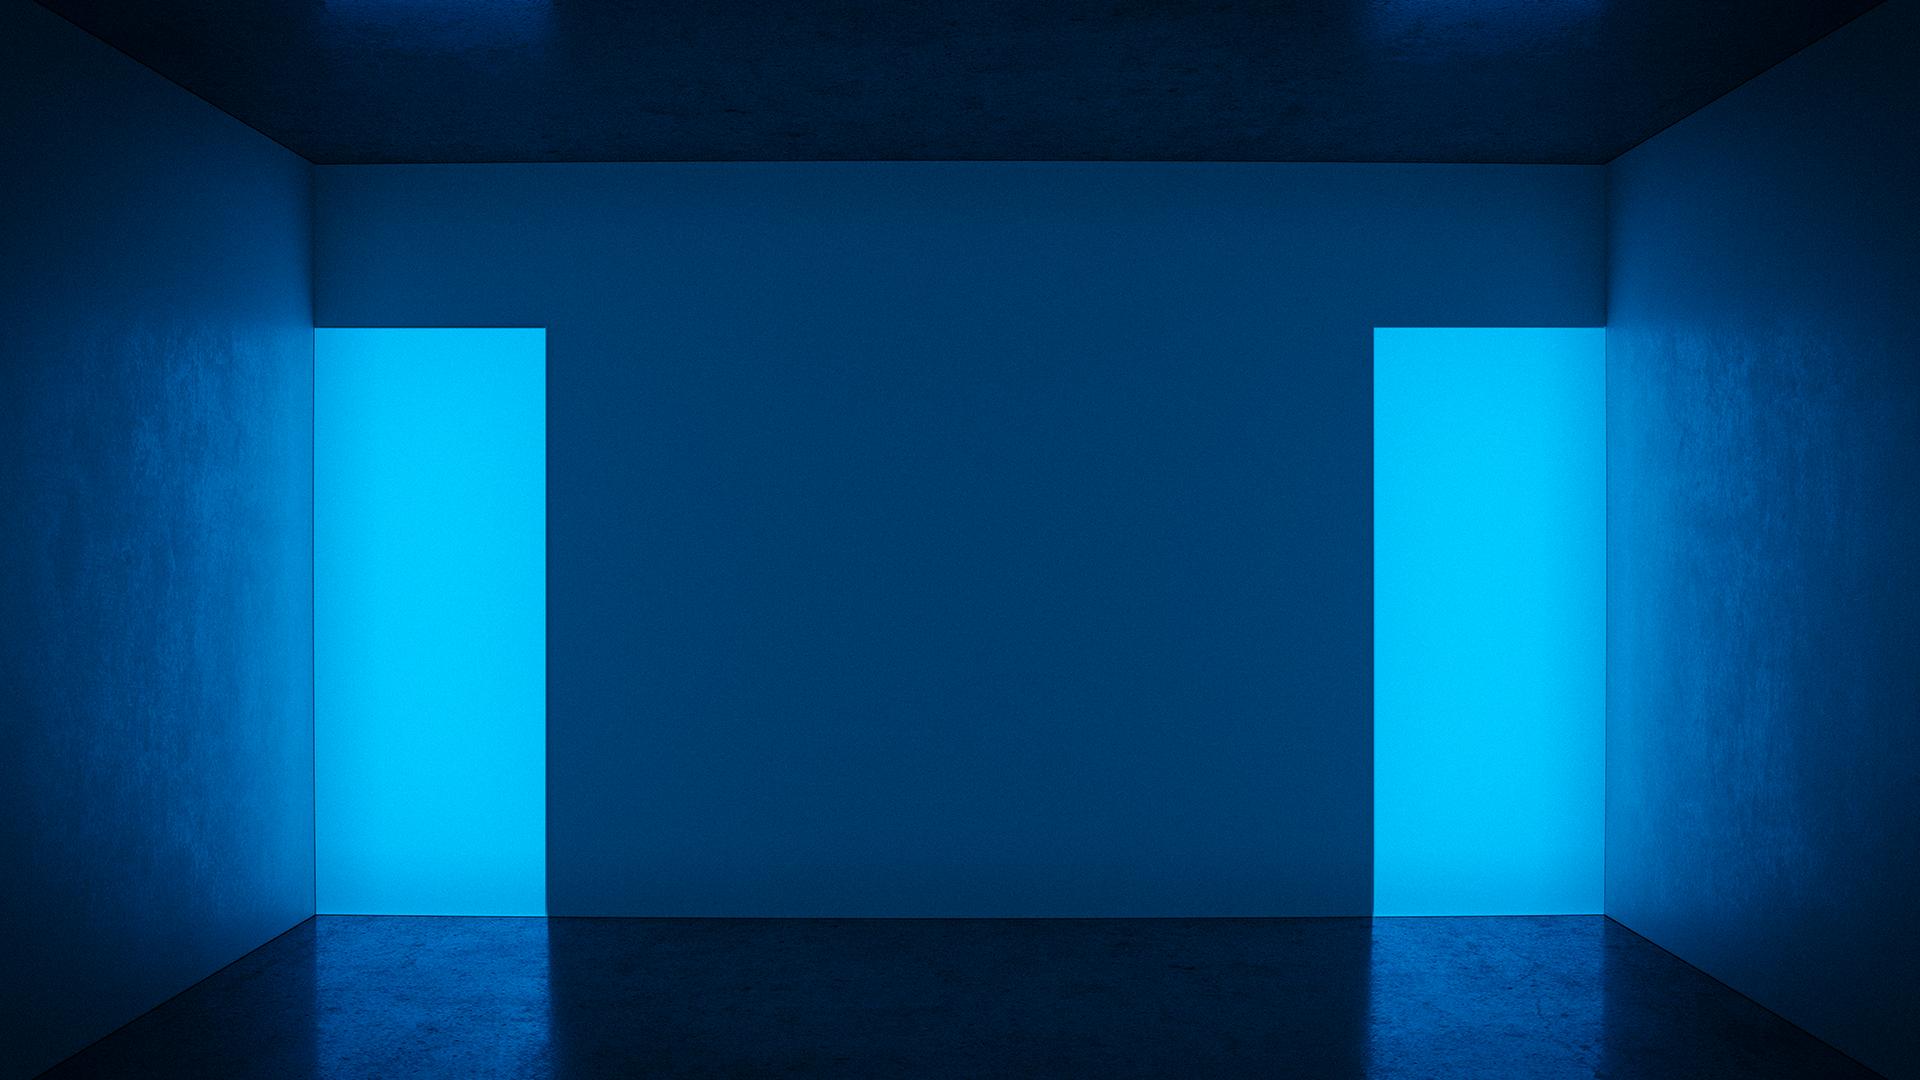 BlackpointDesign-SetDesign-CGI-01.jpg